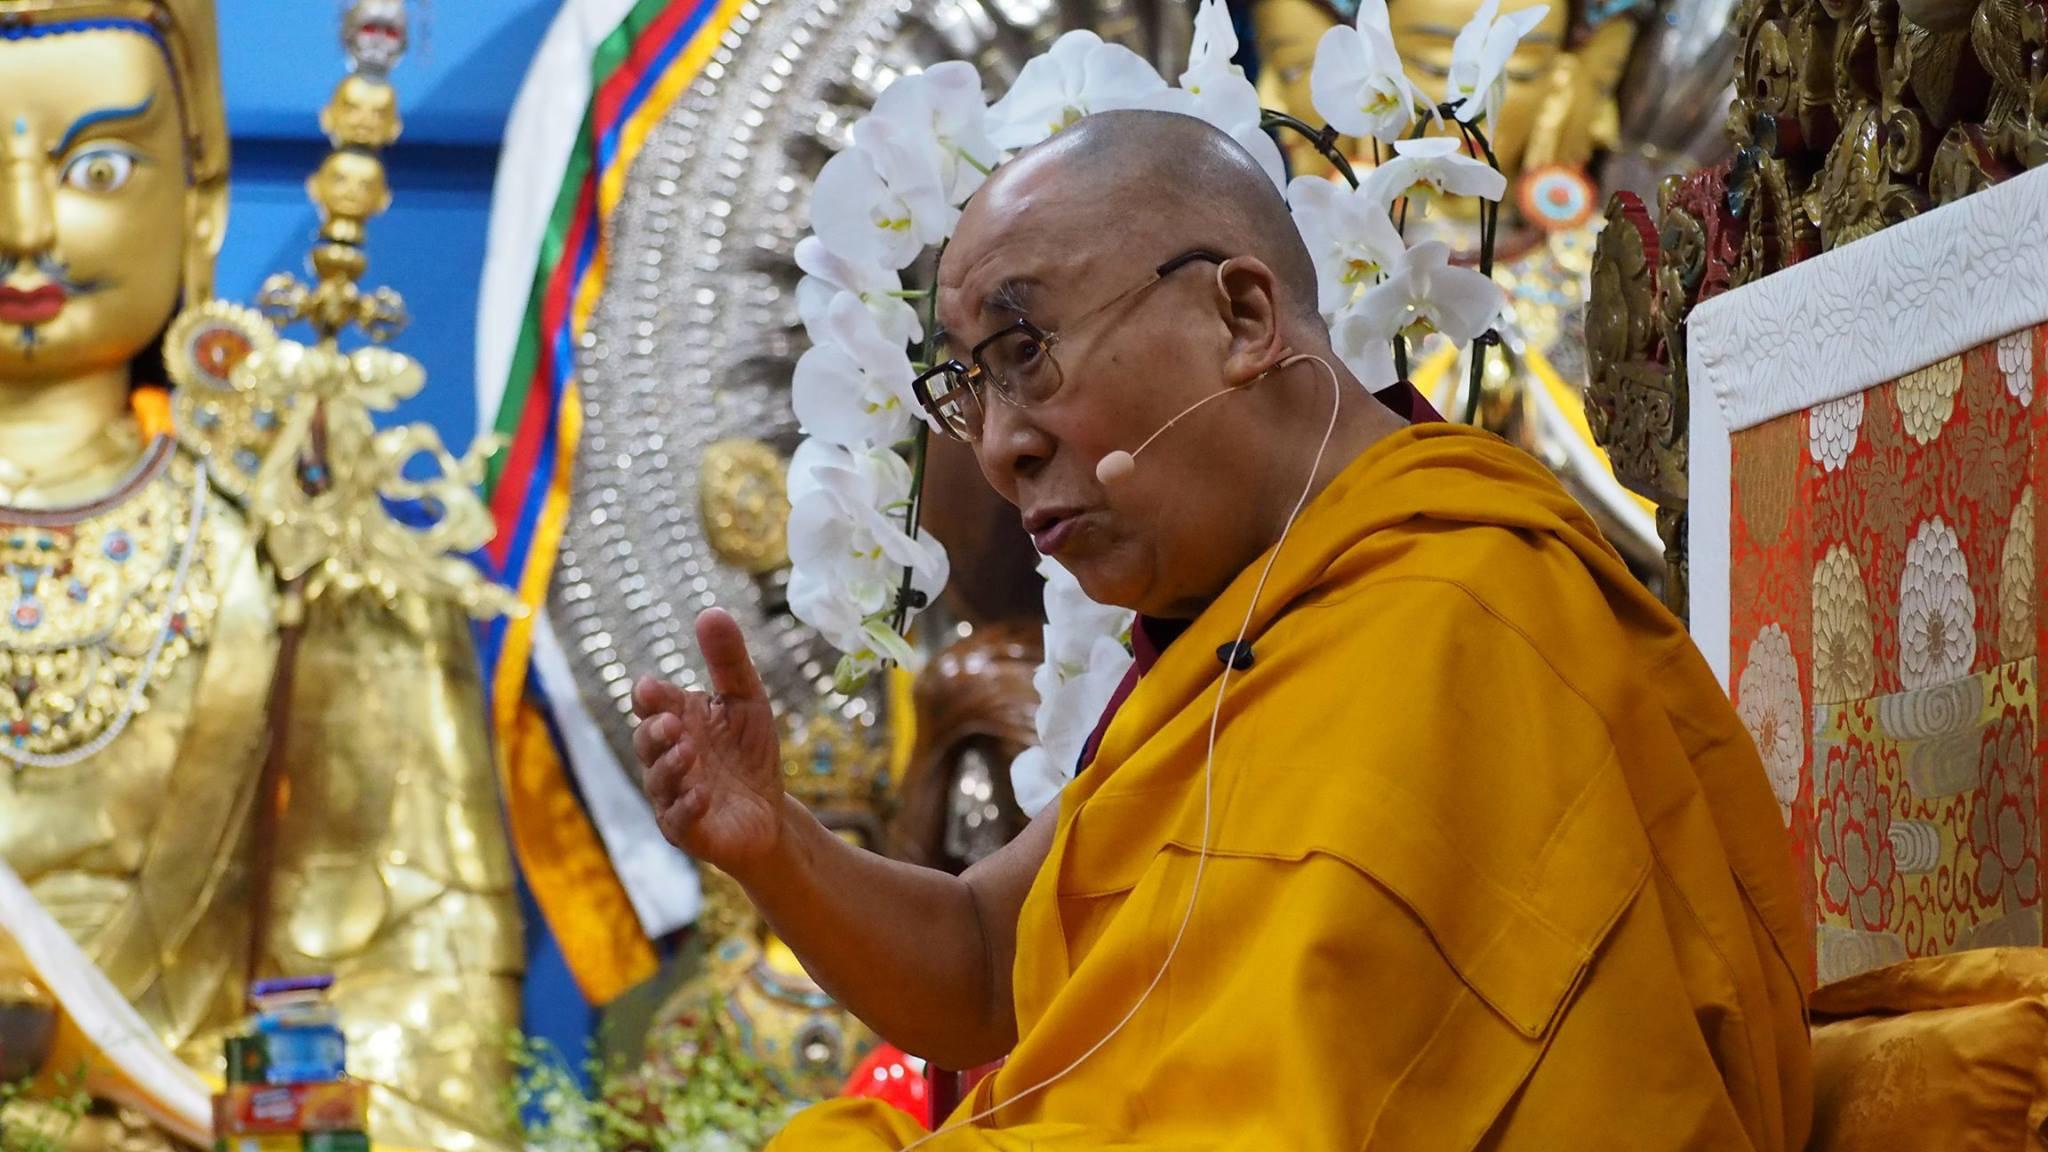 His Holiness the Dalai Lama teaching in Thekchen Choling, Dharamsala, India. (Photo Ven Tenzin Tsultrim)